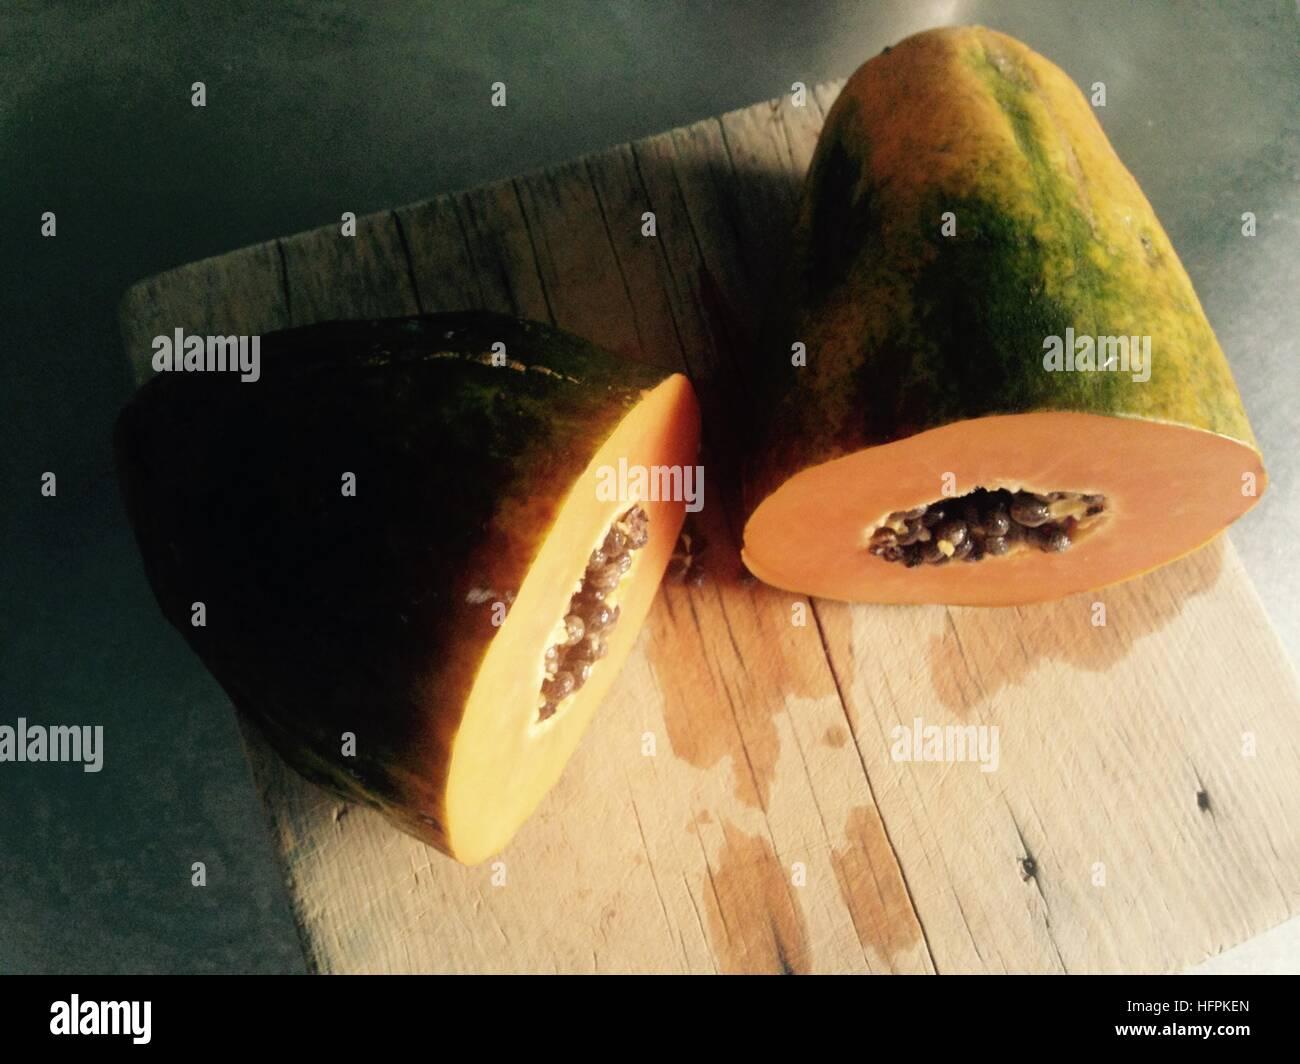 Eine gute Reife Papaya, süß und lecker. Stockbild